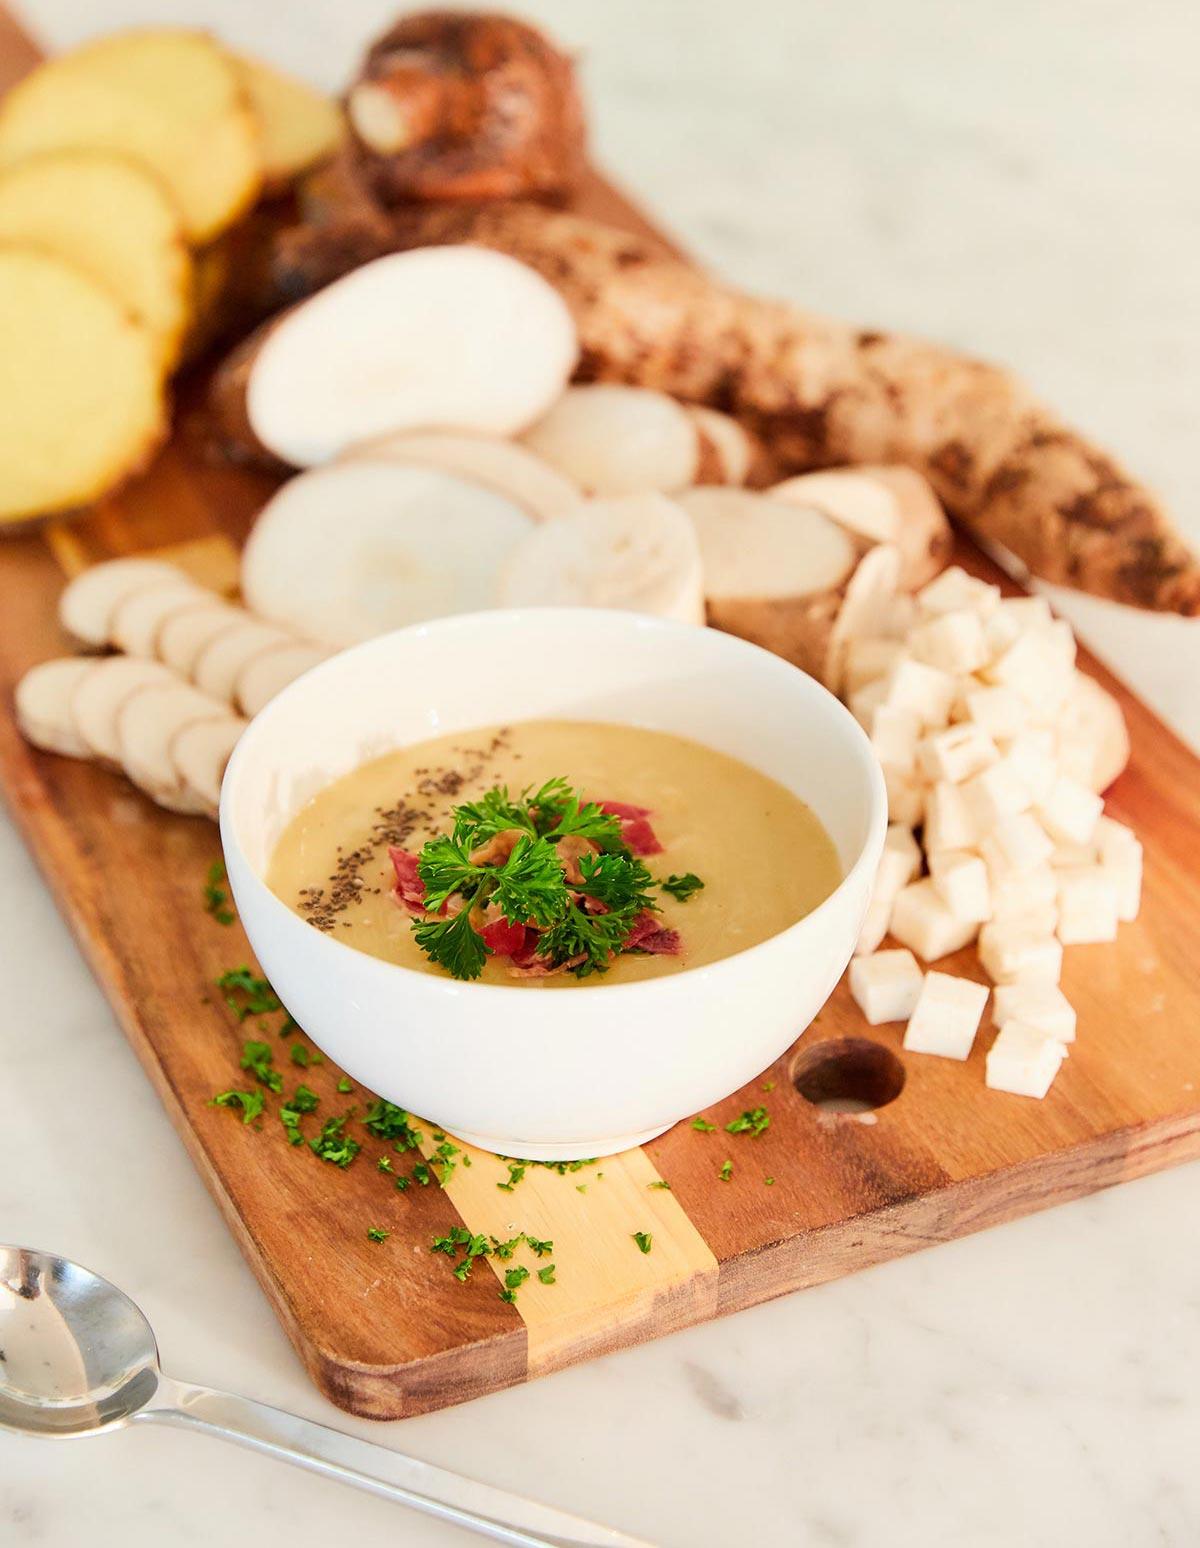 Creamy bowl of cuban malanga soup